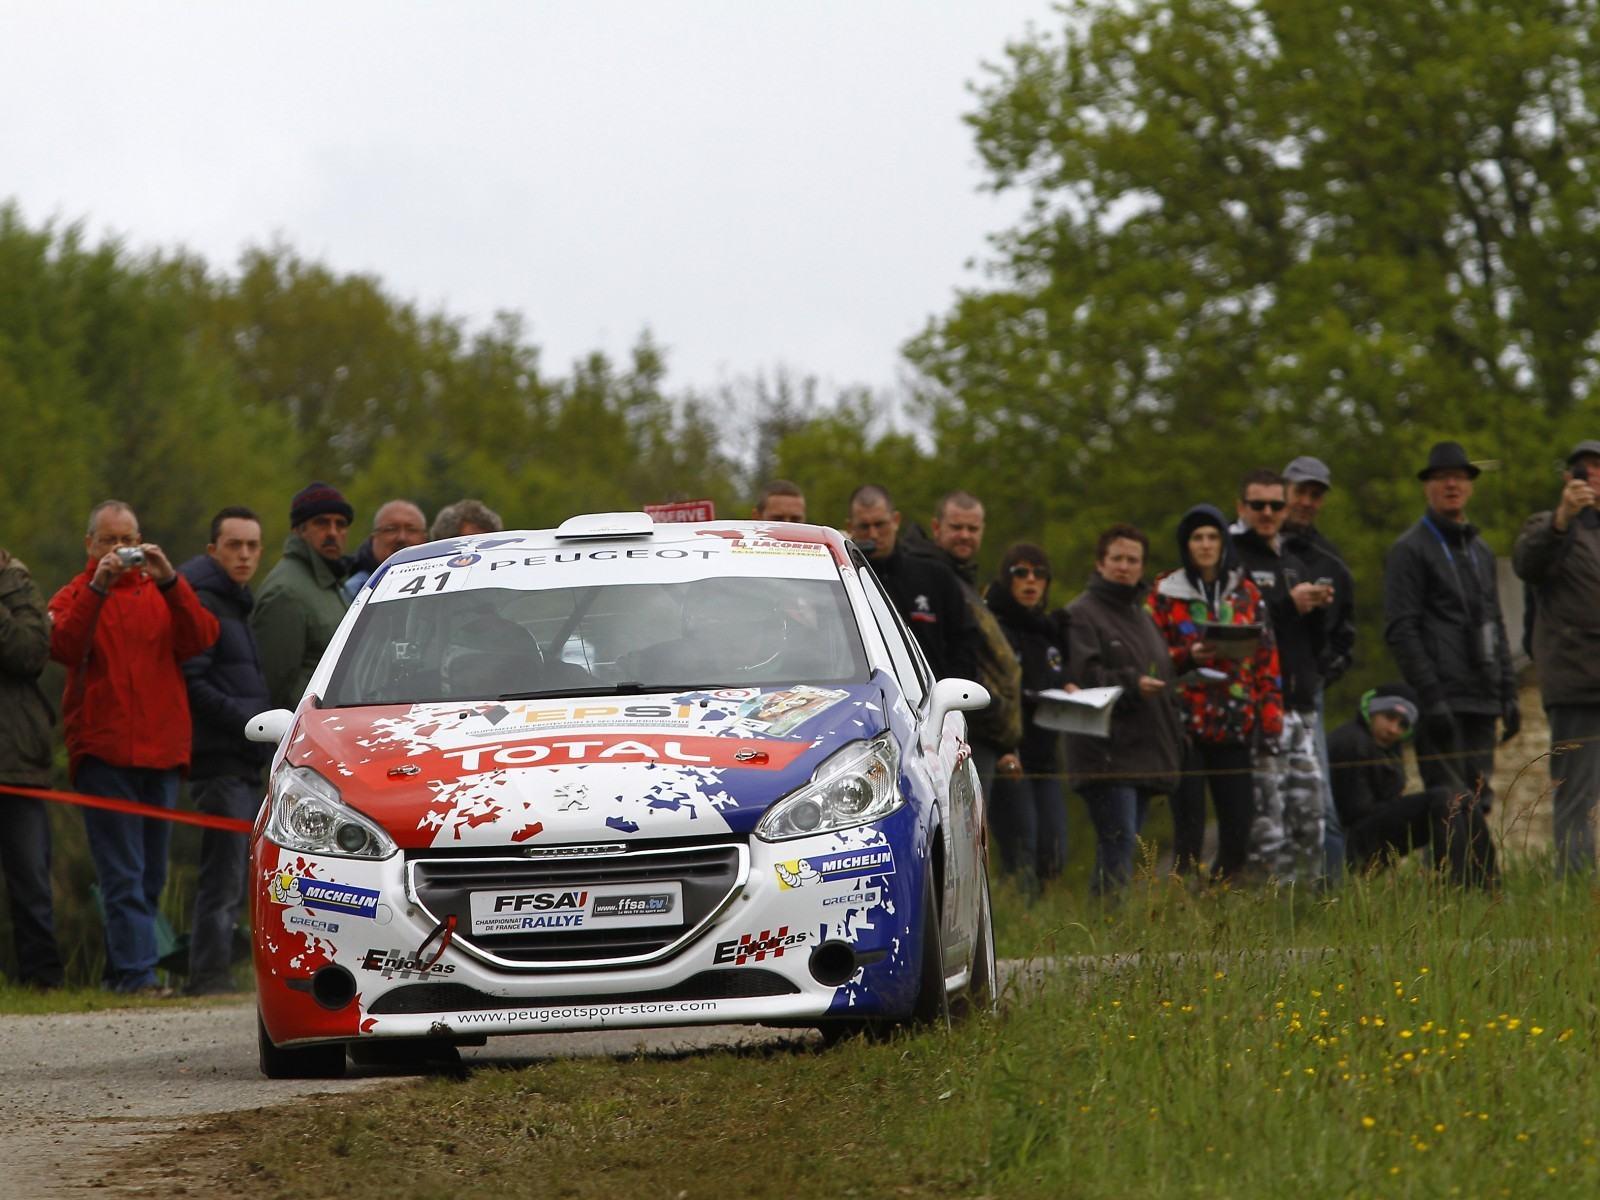 PeugeotSport-